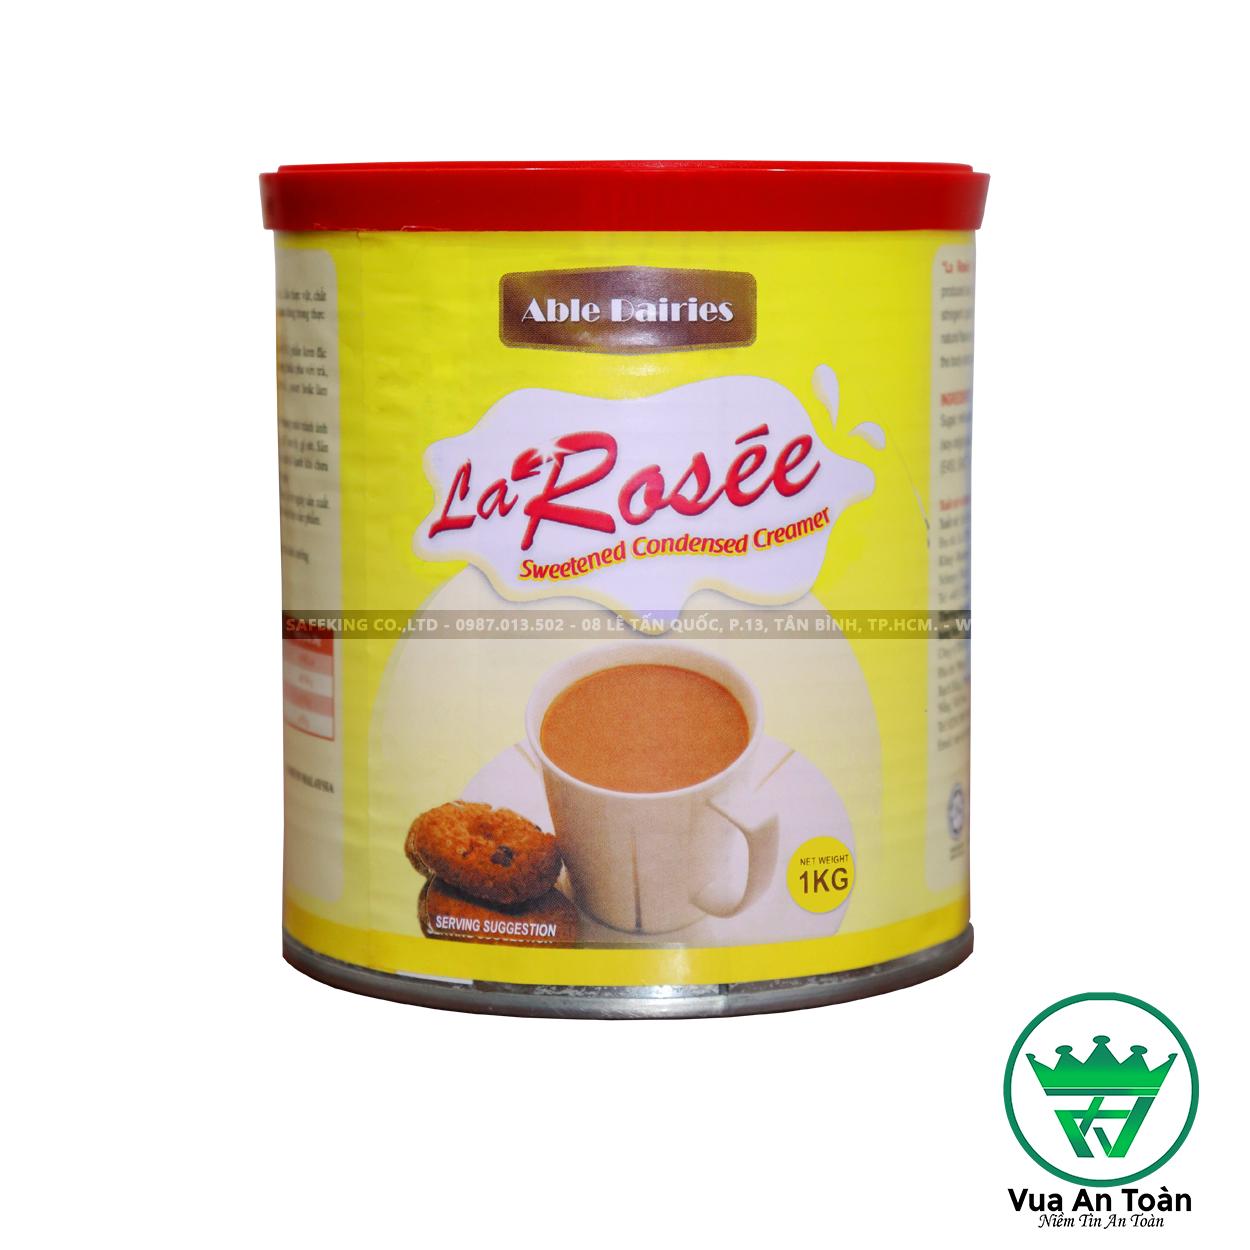 Sữa đặc La Rosée hộp 1kg